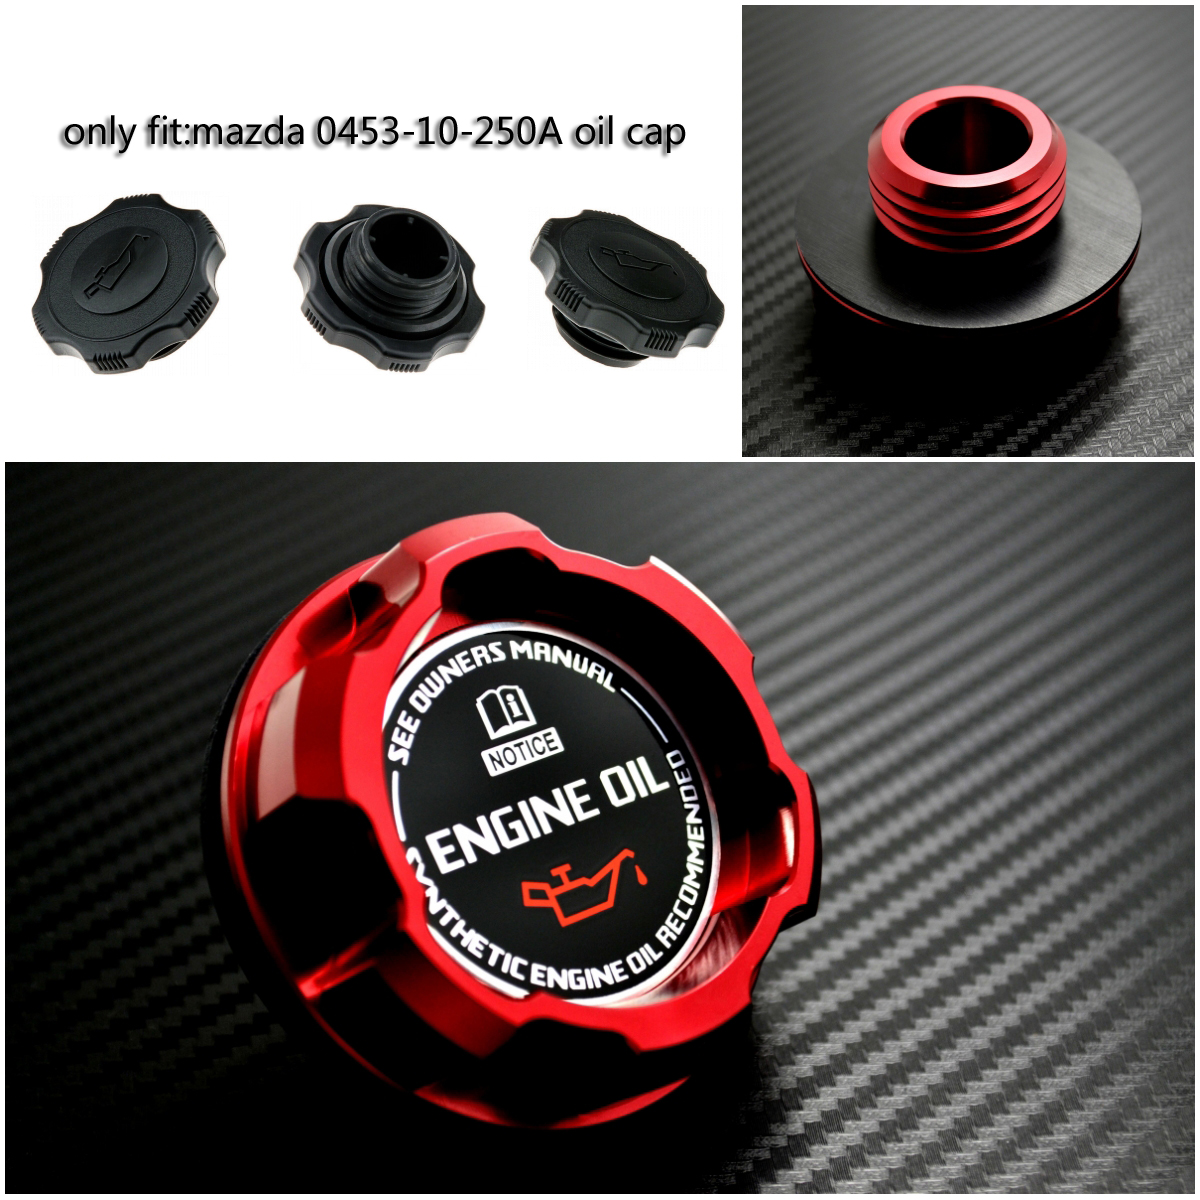 TRIDON B1600 B1800 B2000 B2200 Carb. New Oil Cap For Mazda B1500